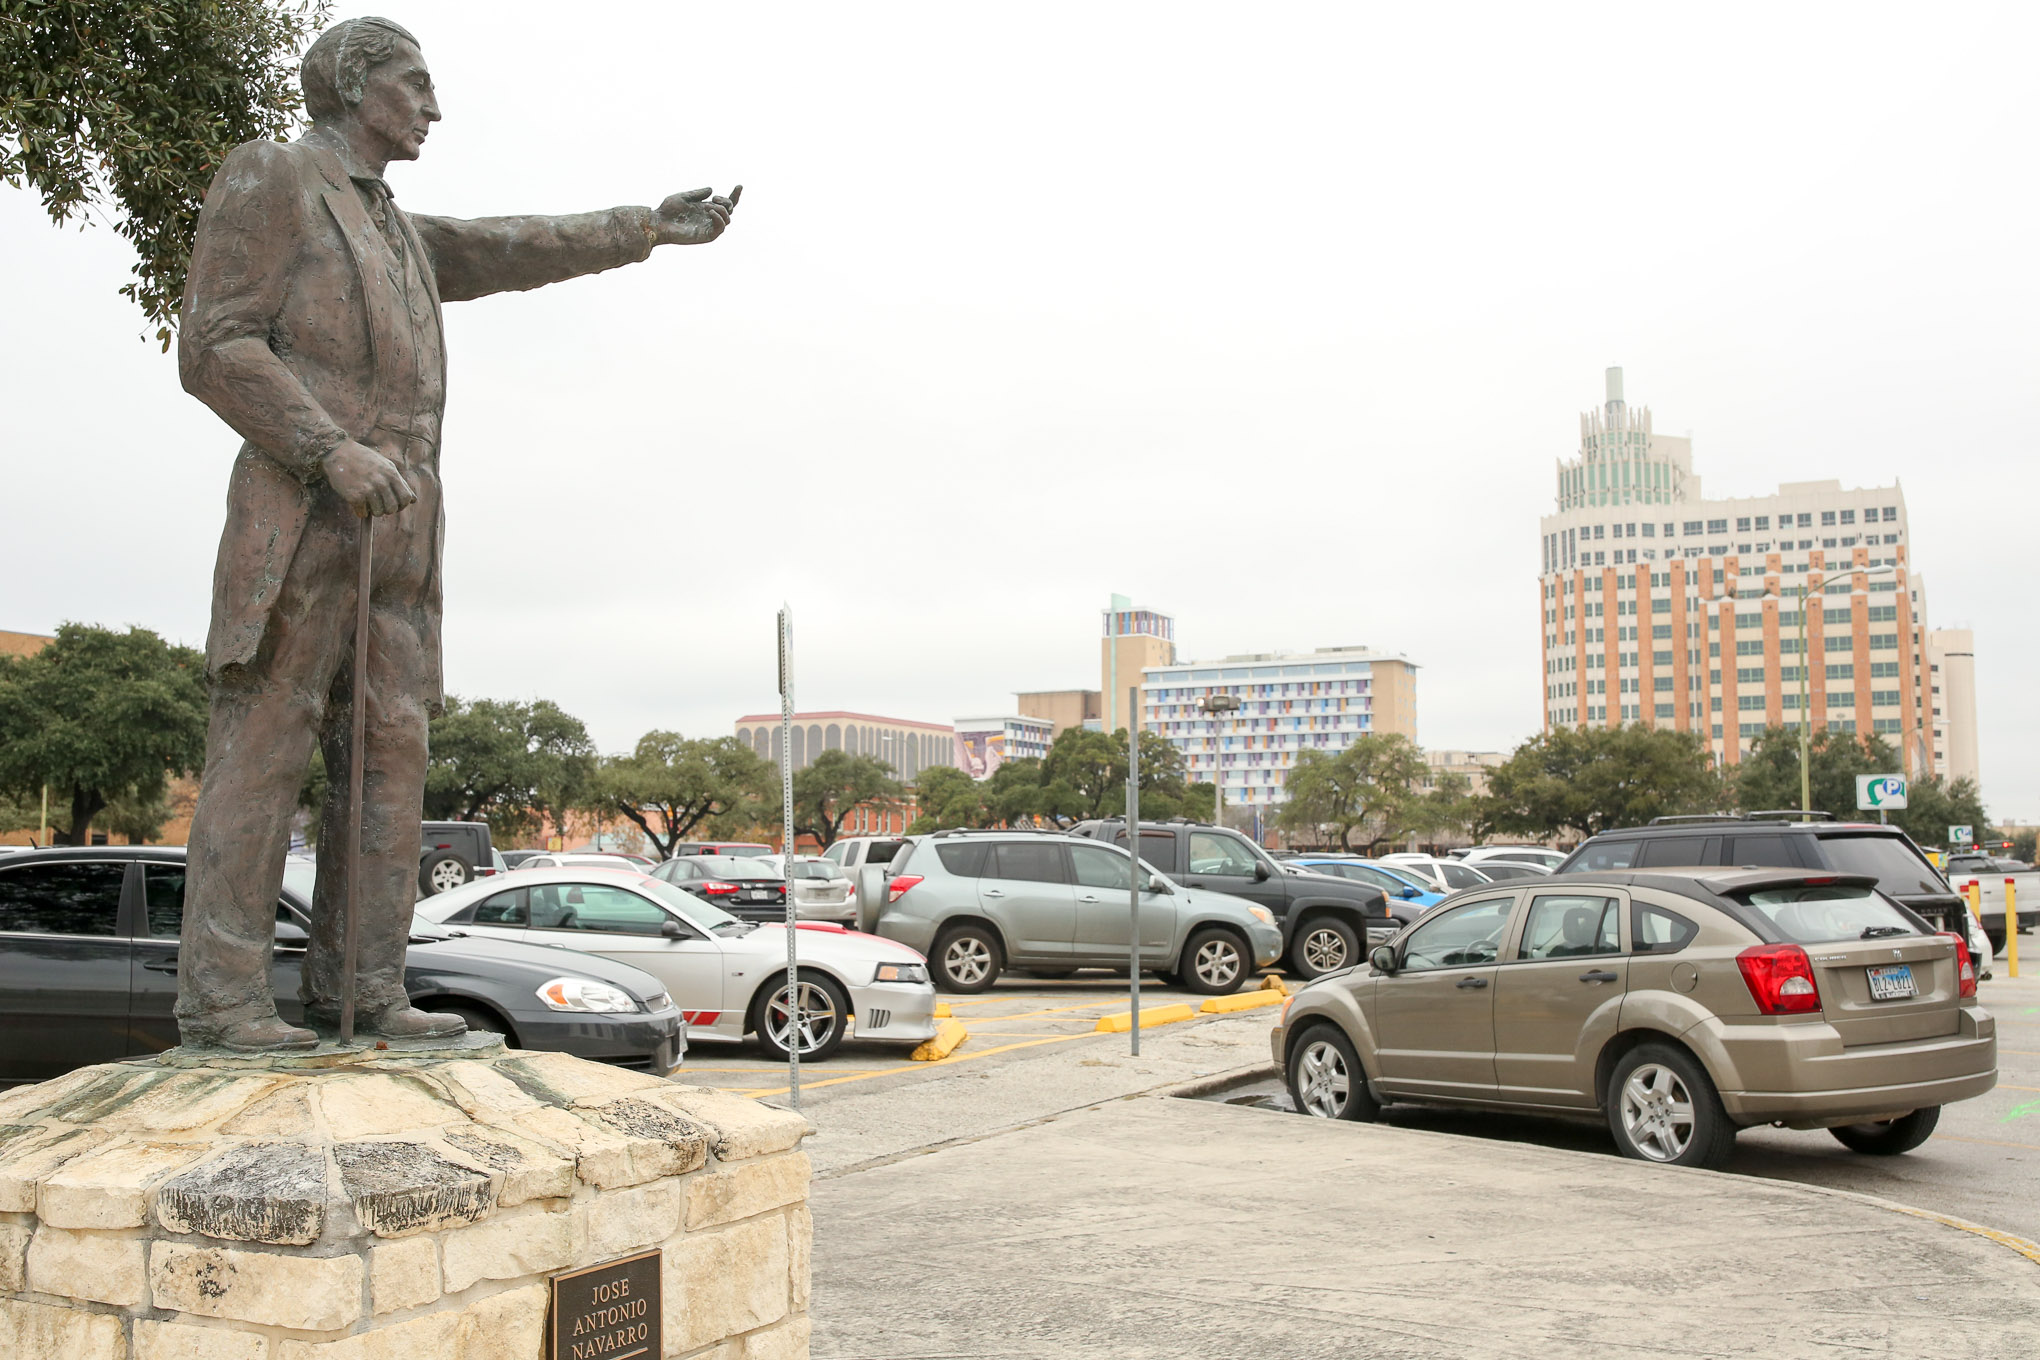 A statue of José Antonio Navarro stands across the street from Casa Navarro.